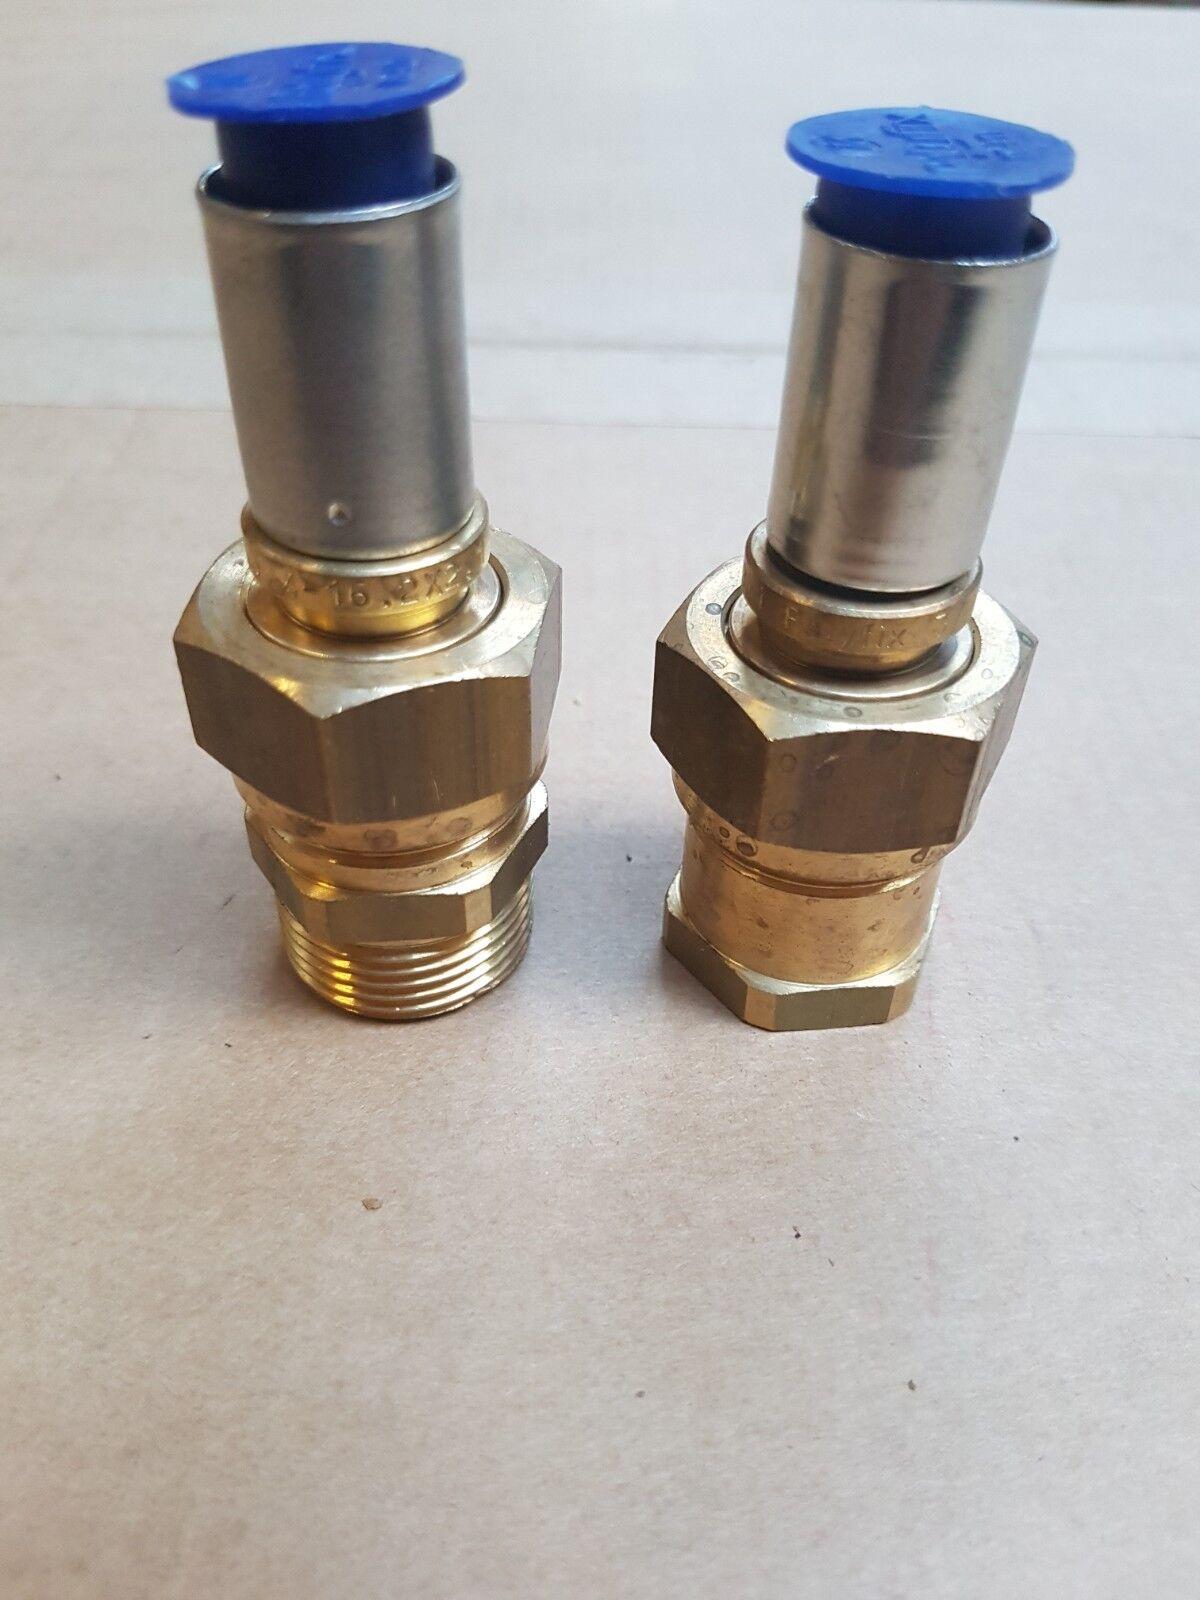 Angebot Kan-therm Press Fitting PPSU Kupplung reduziert K-070073 25 x 26 mm Neu